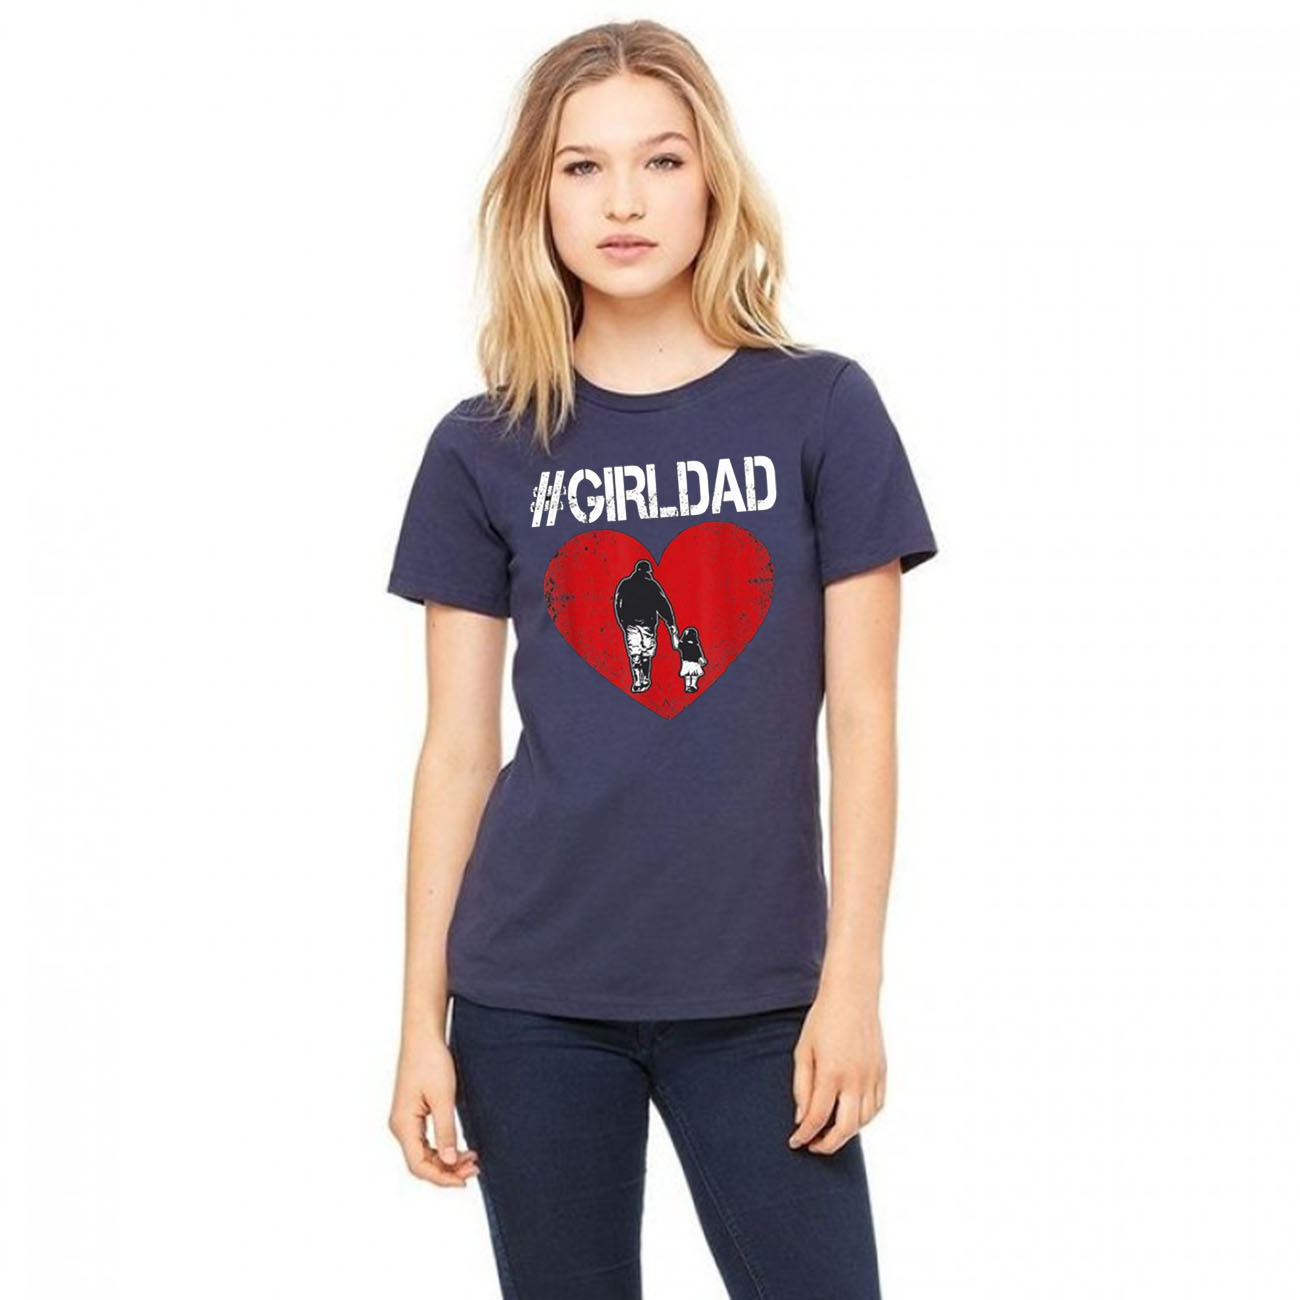 #girldad Girl Dad Father of Girls Unisex T-Shirts